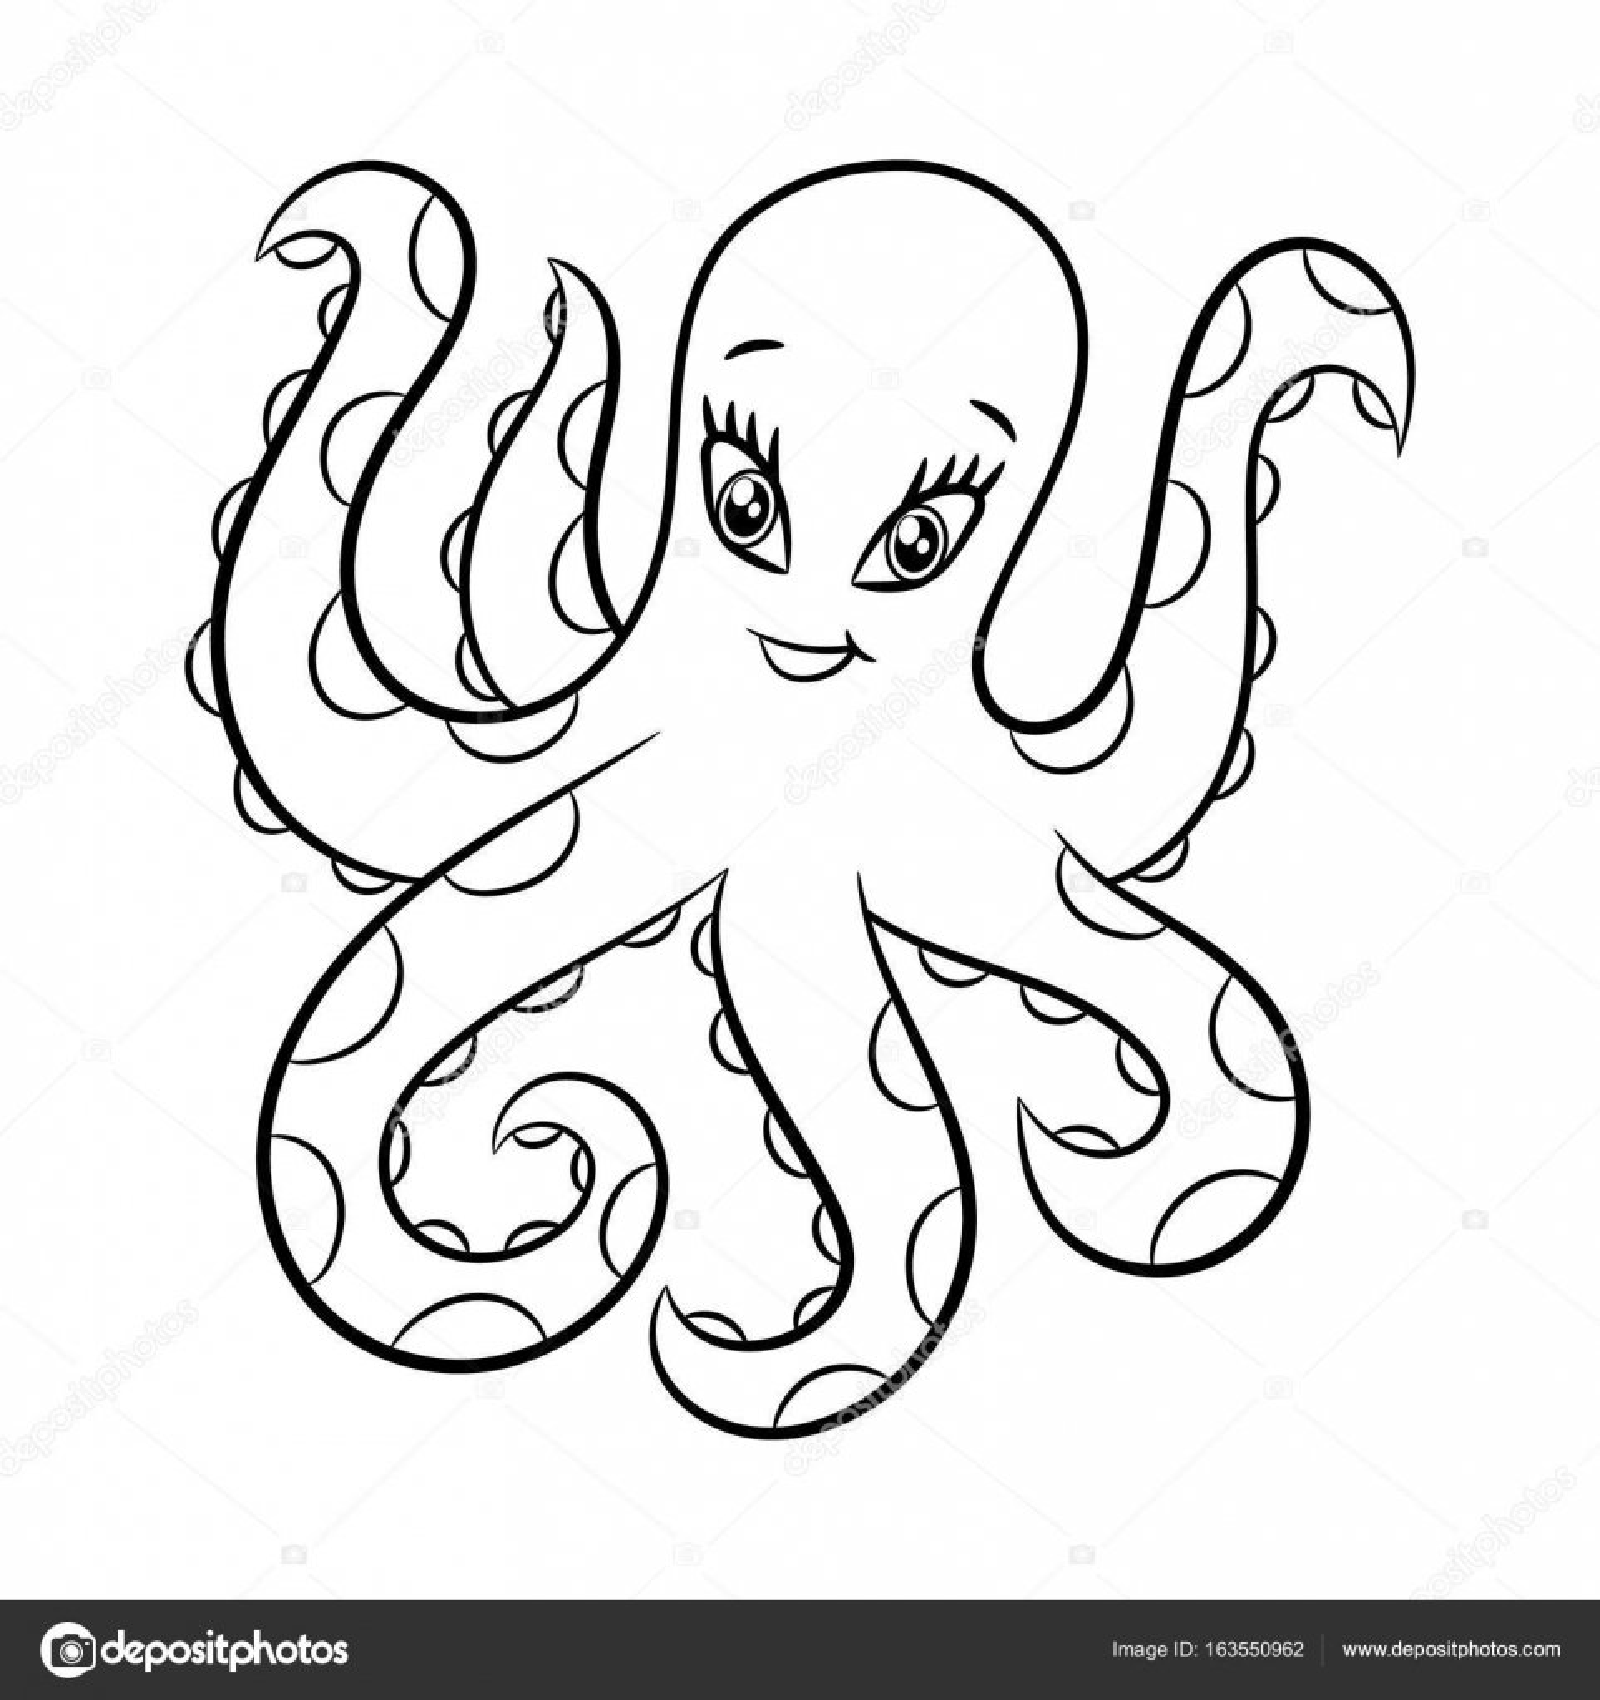 Octopus Kleurboek Stockvector C Ismagilovilnaz999 163550962